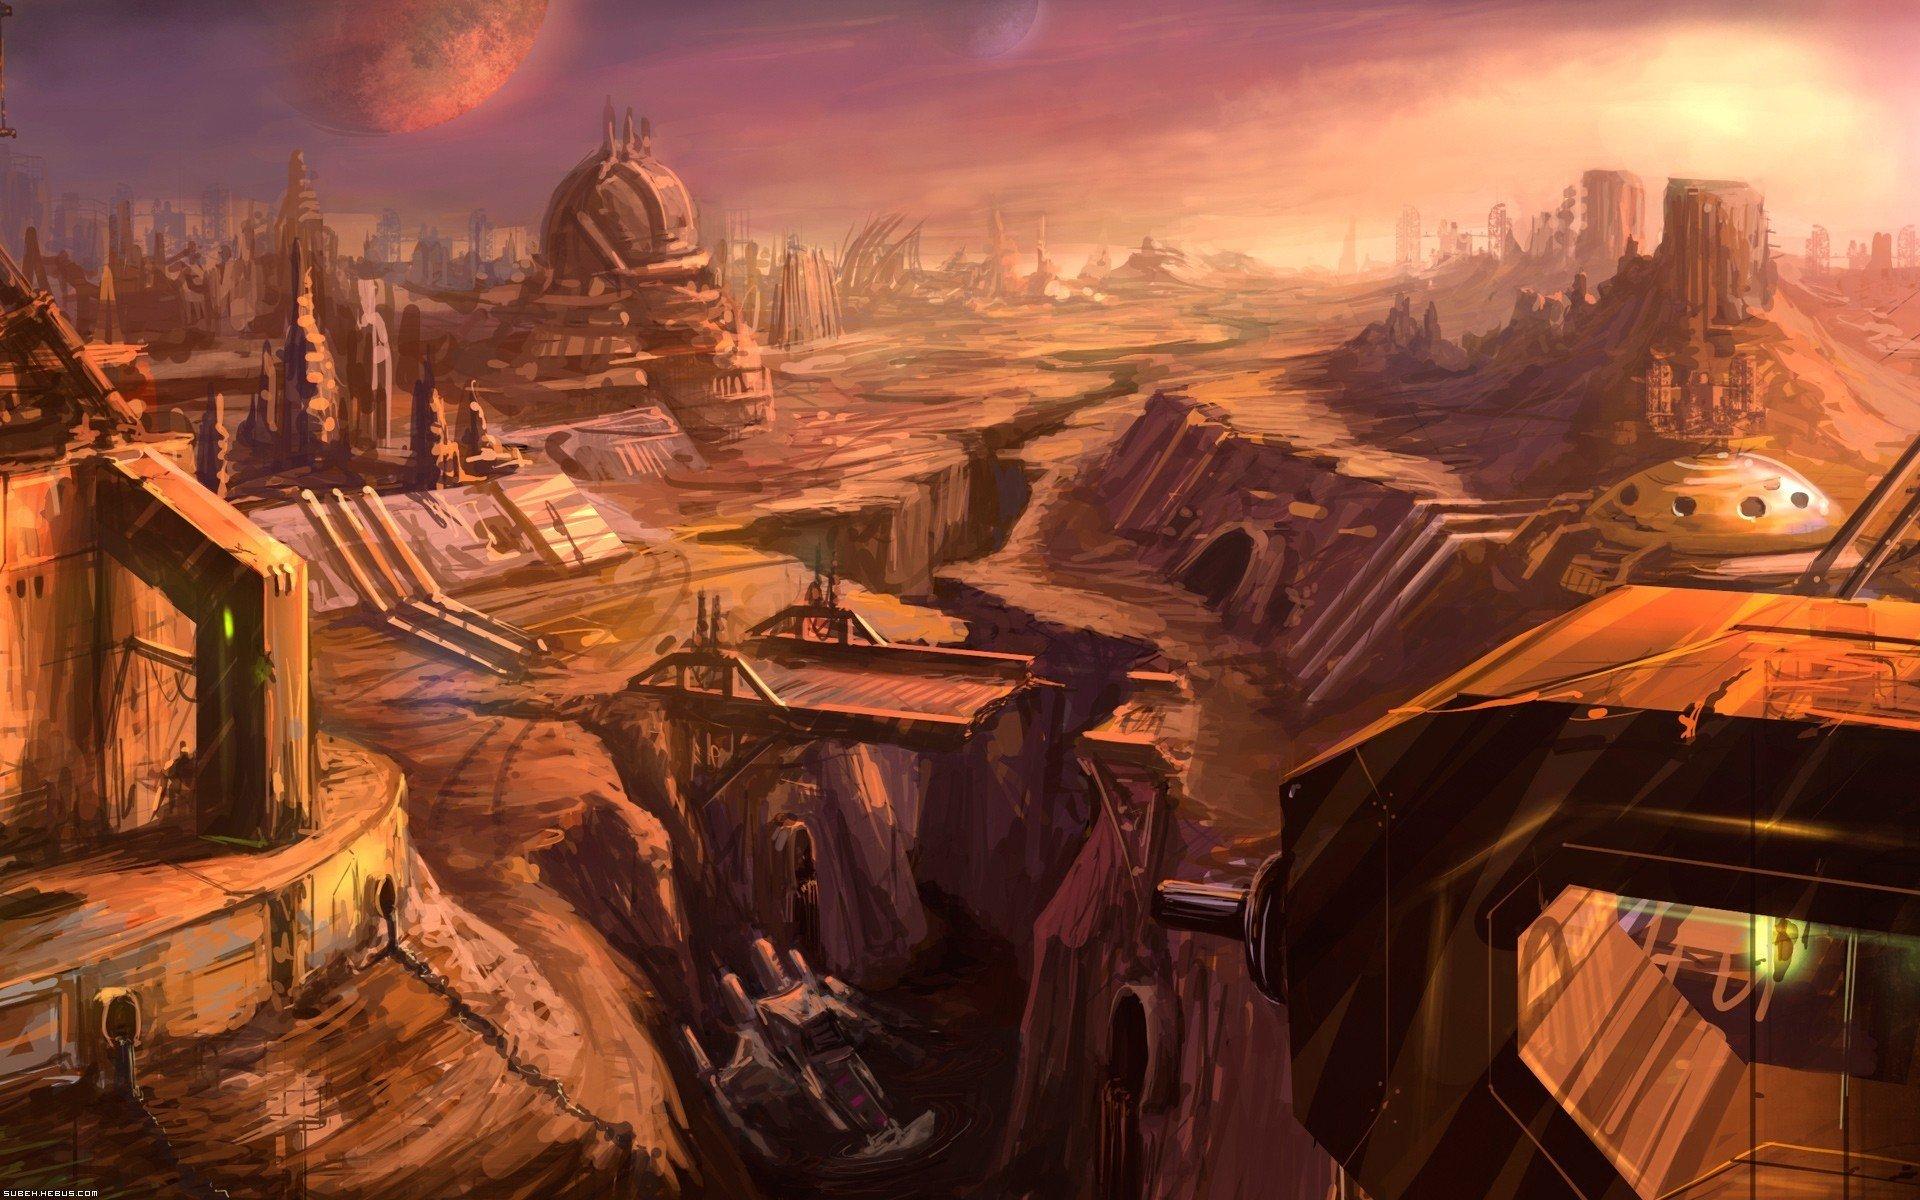 Wallpaper 1920x1200 Px Ruin Science Fiction 1920x1200